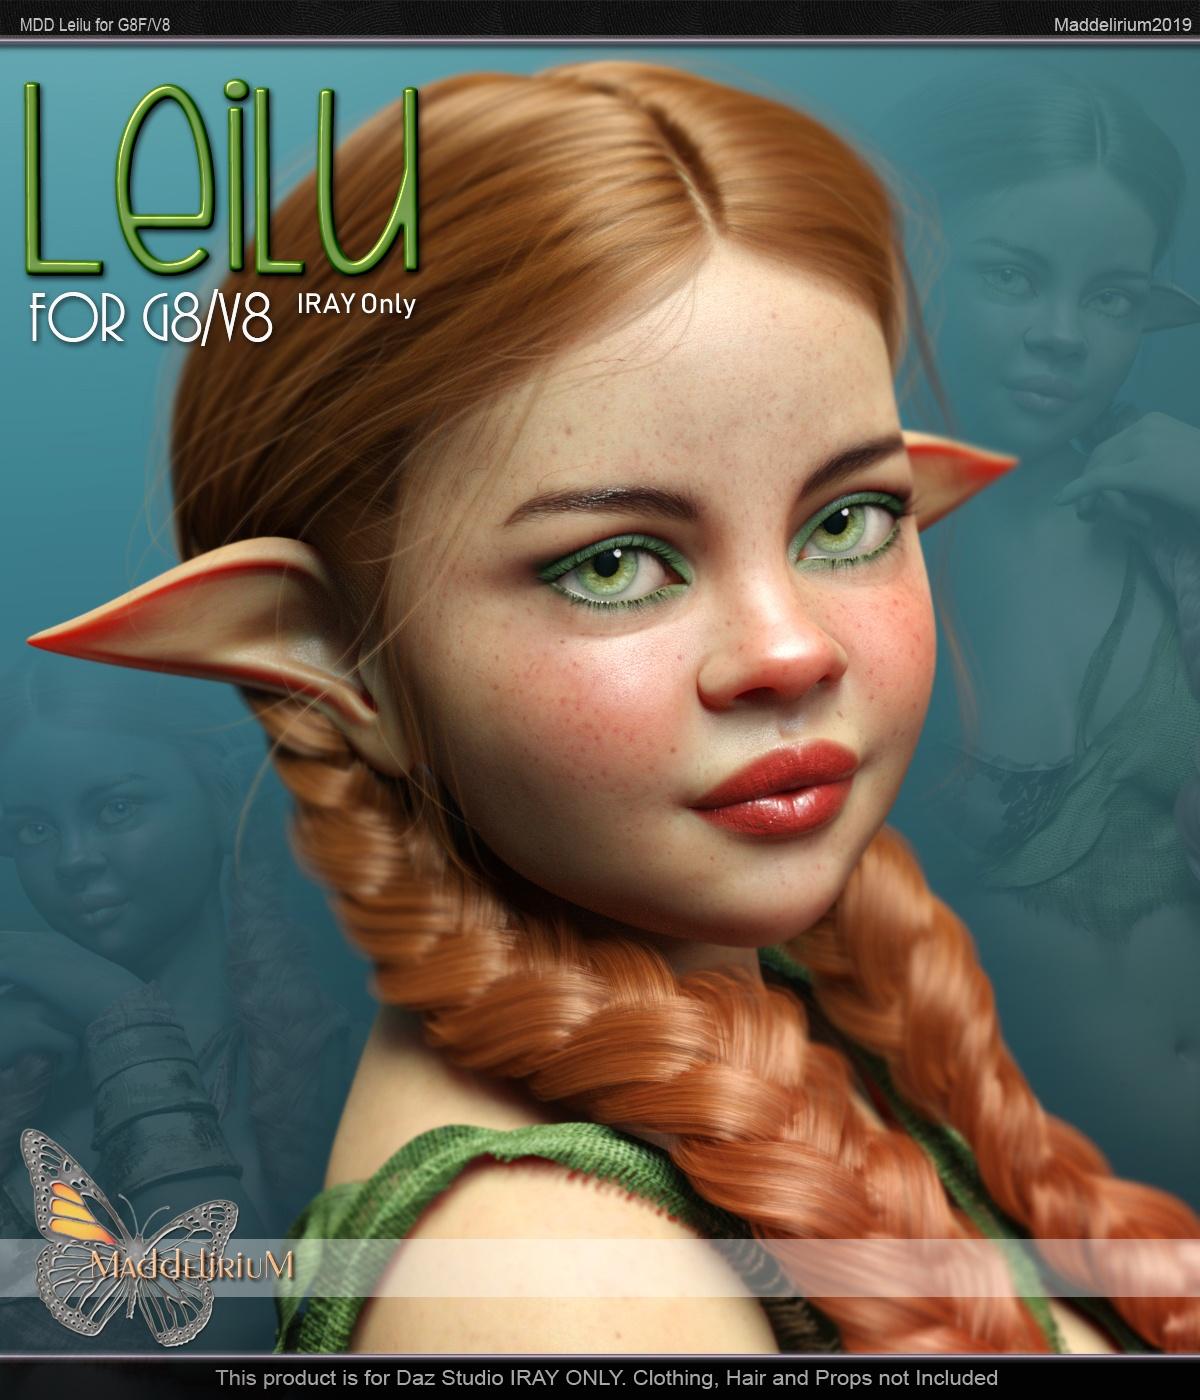 mdd-leilu-for-g8v8-iray-only